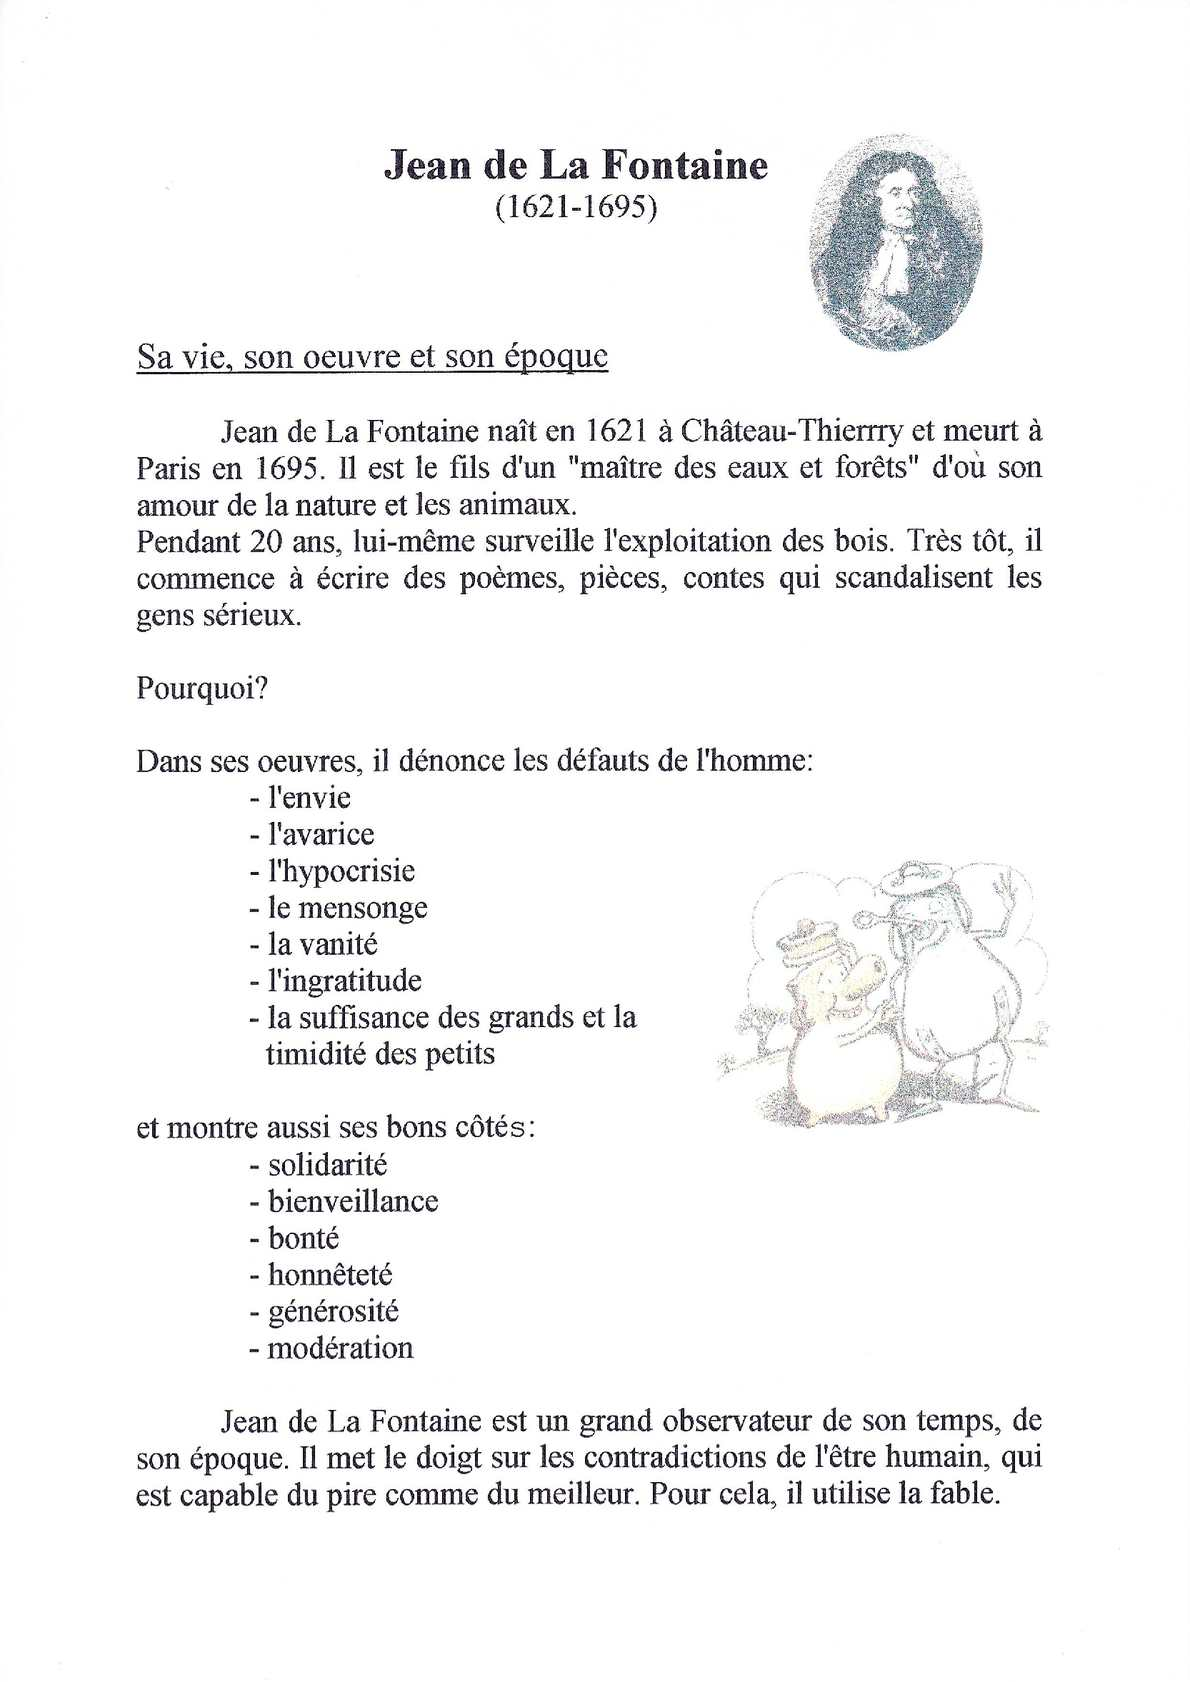 Calaméo Bibliographie Jean De La Fontaine 1995